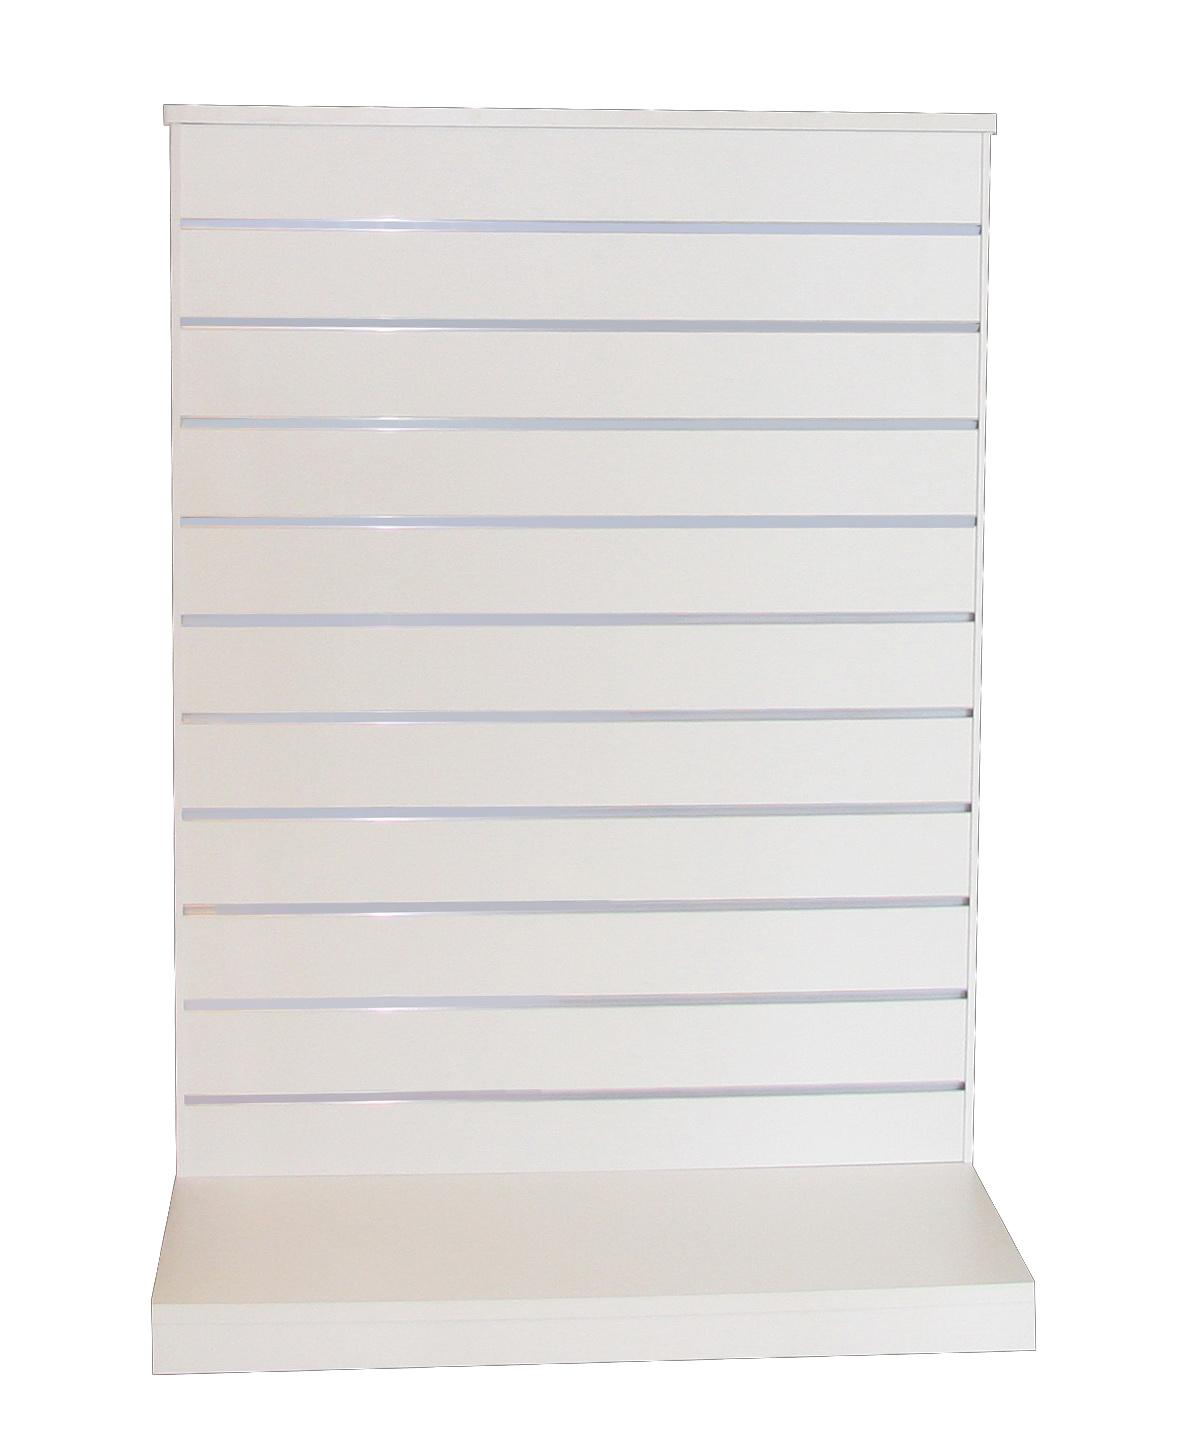 Panel L-Display